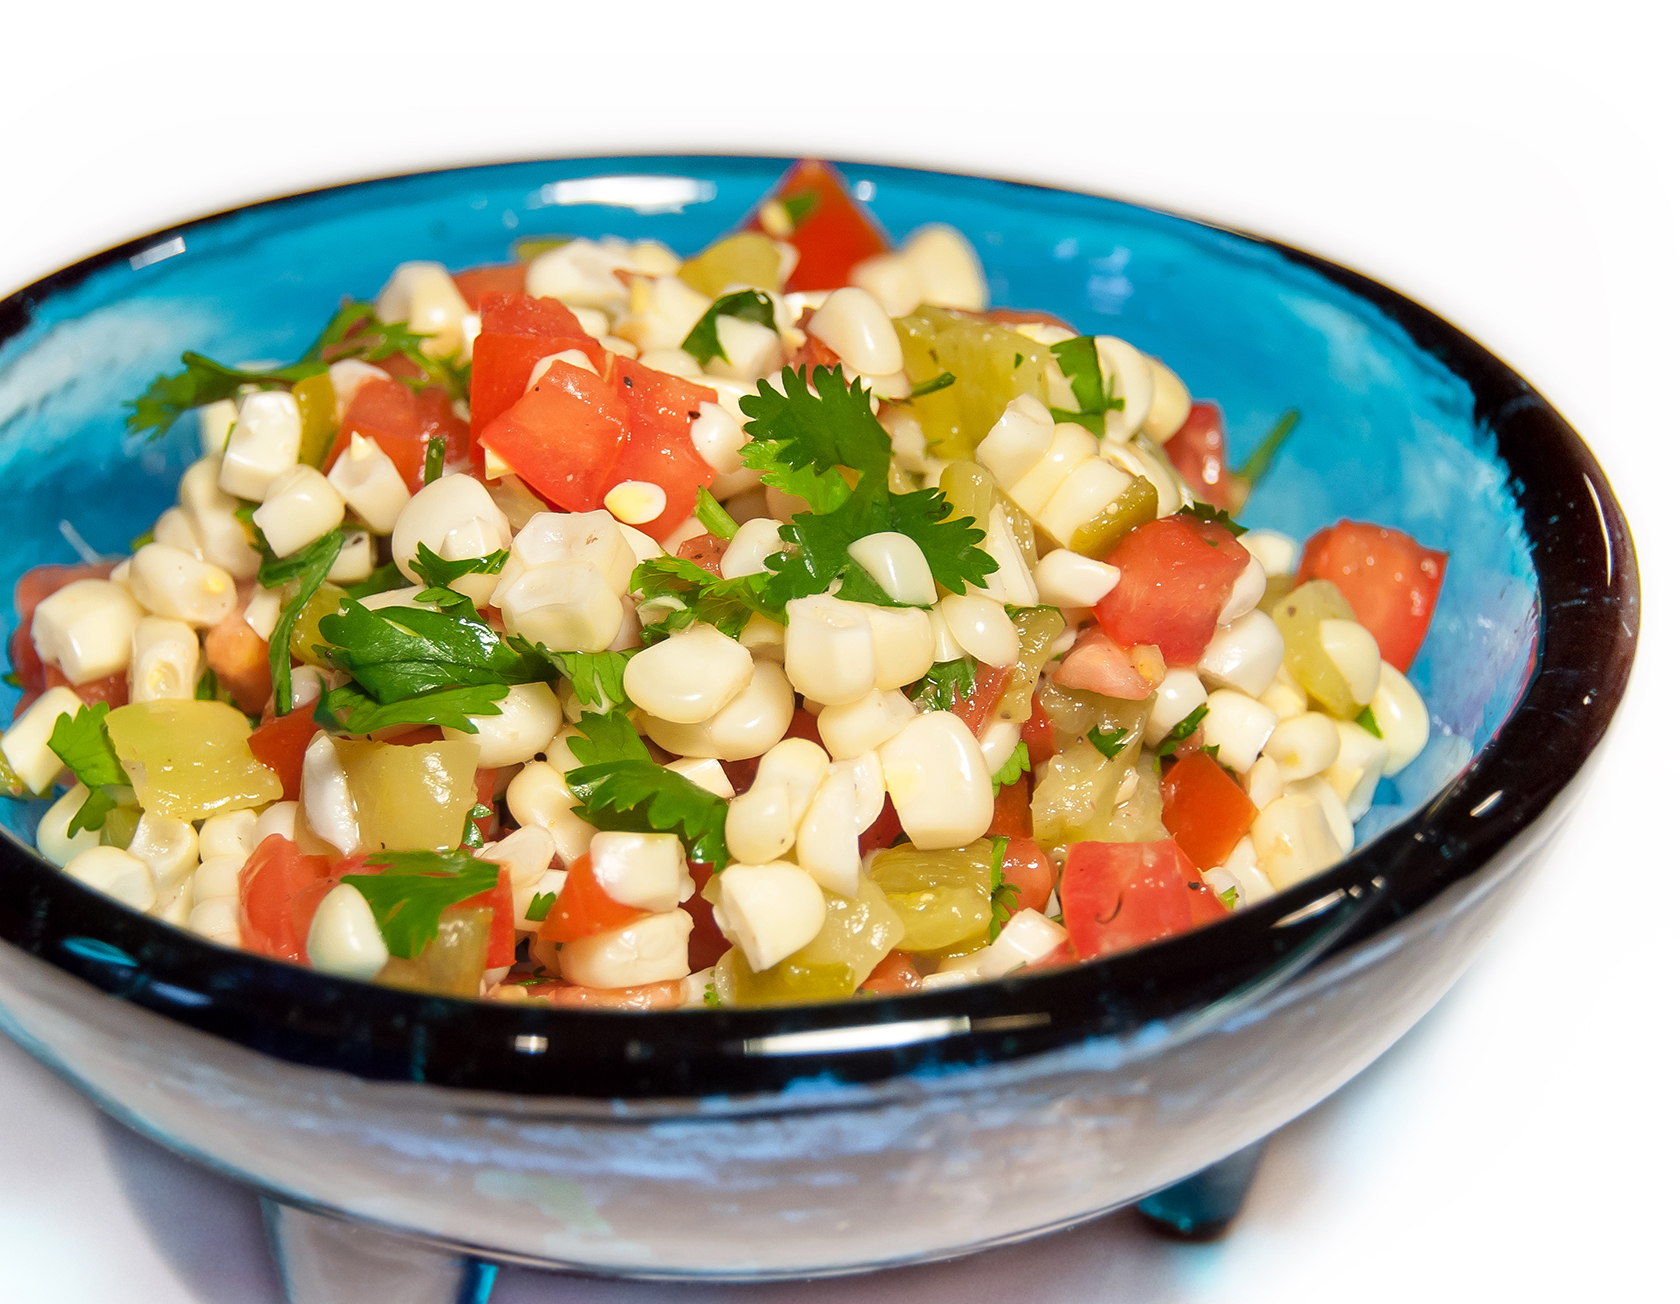 ... roasted corn salsa oven roasted corn salad roasted corn relish recipe